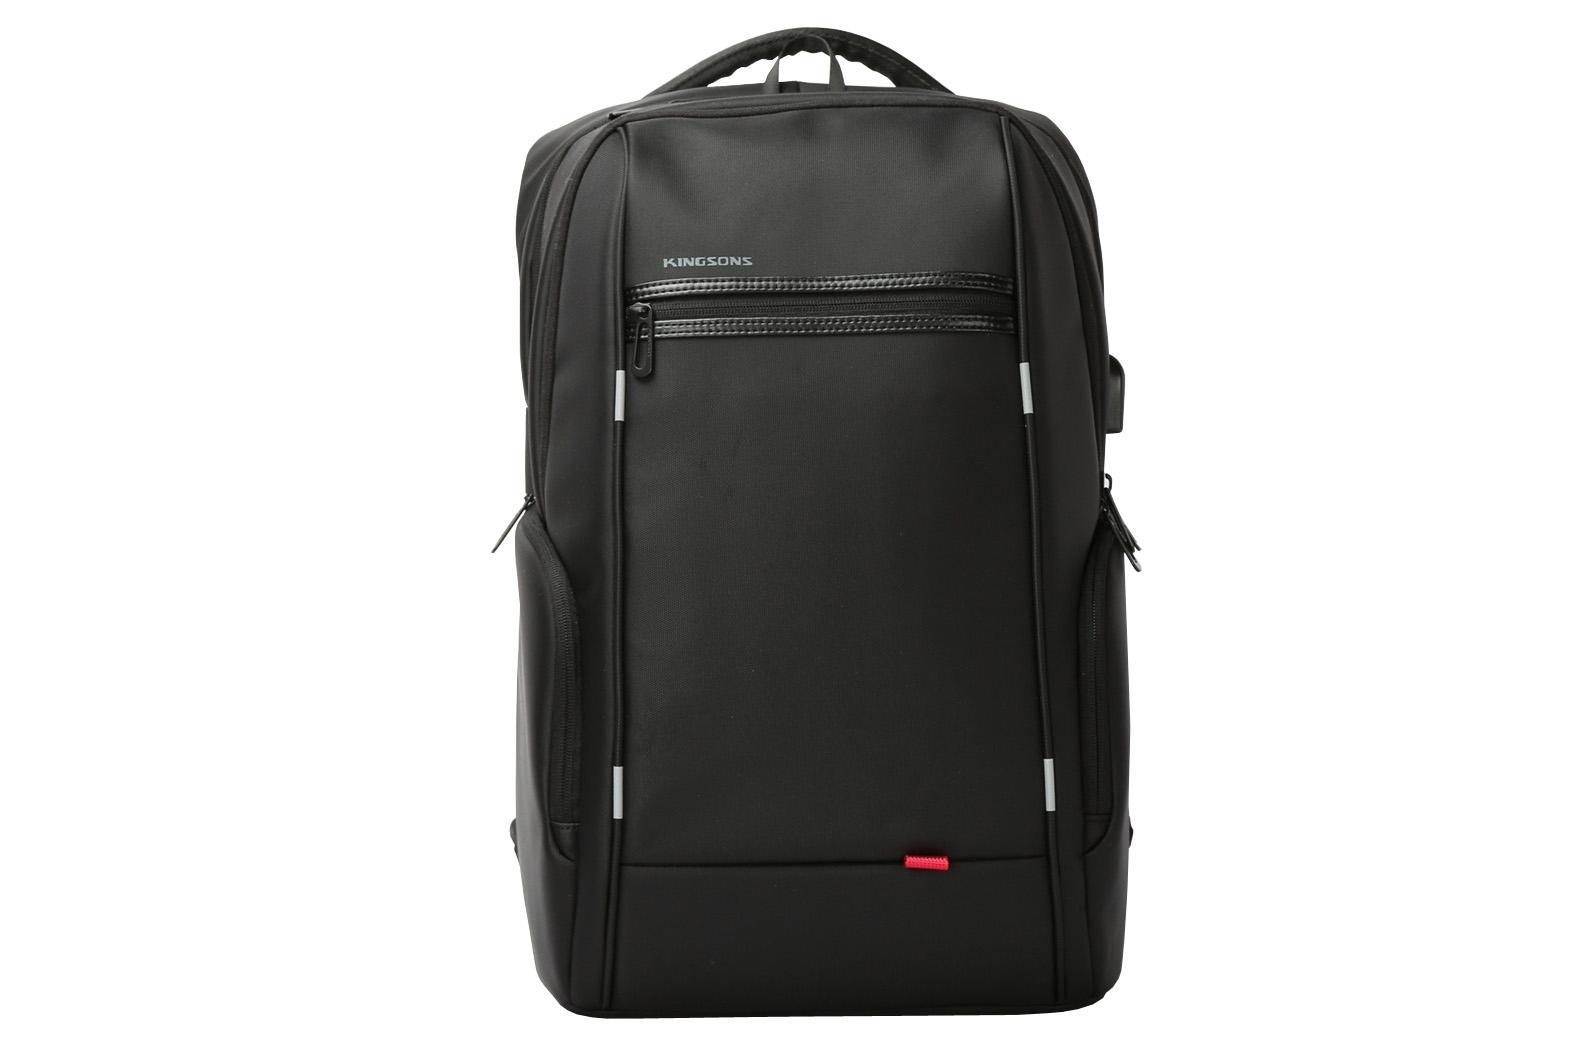 "Kingsons K9004-BK 15.6"" Power Series Smart Backpack With Built-in USB - Black"